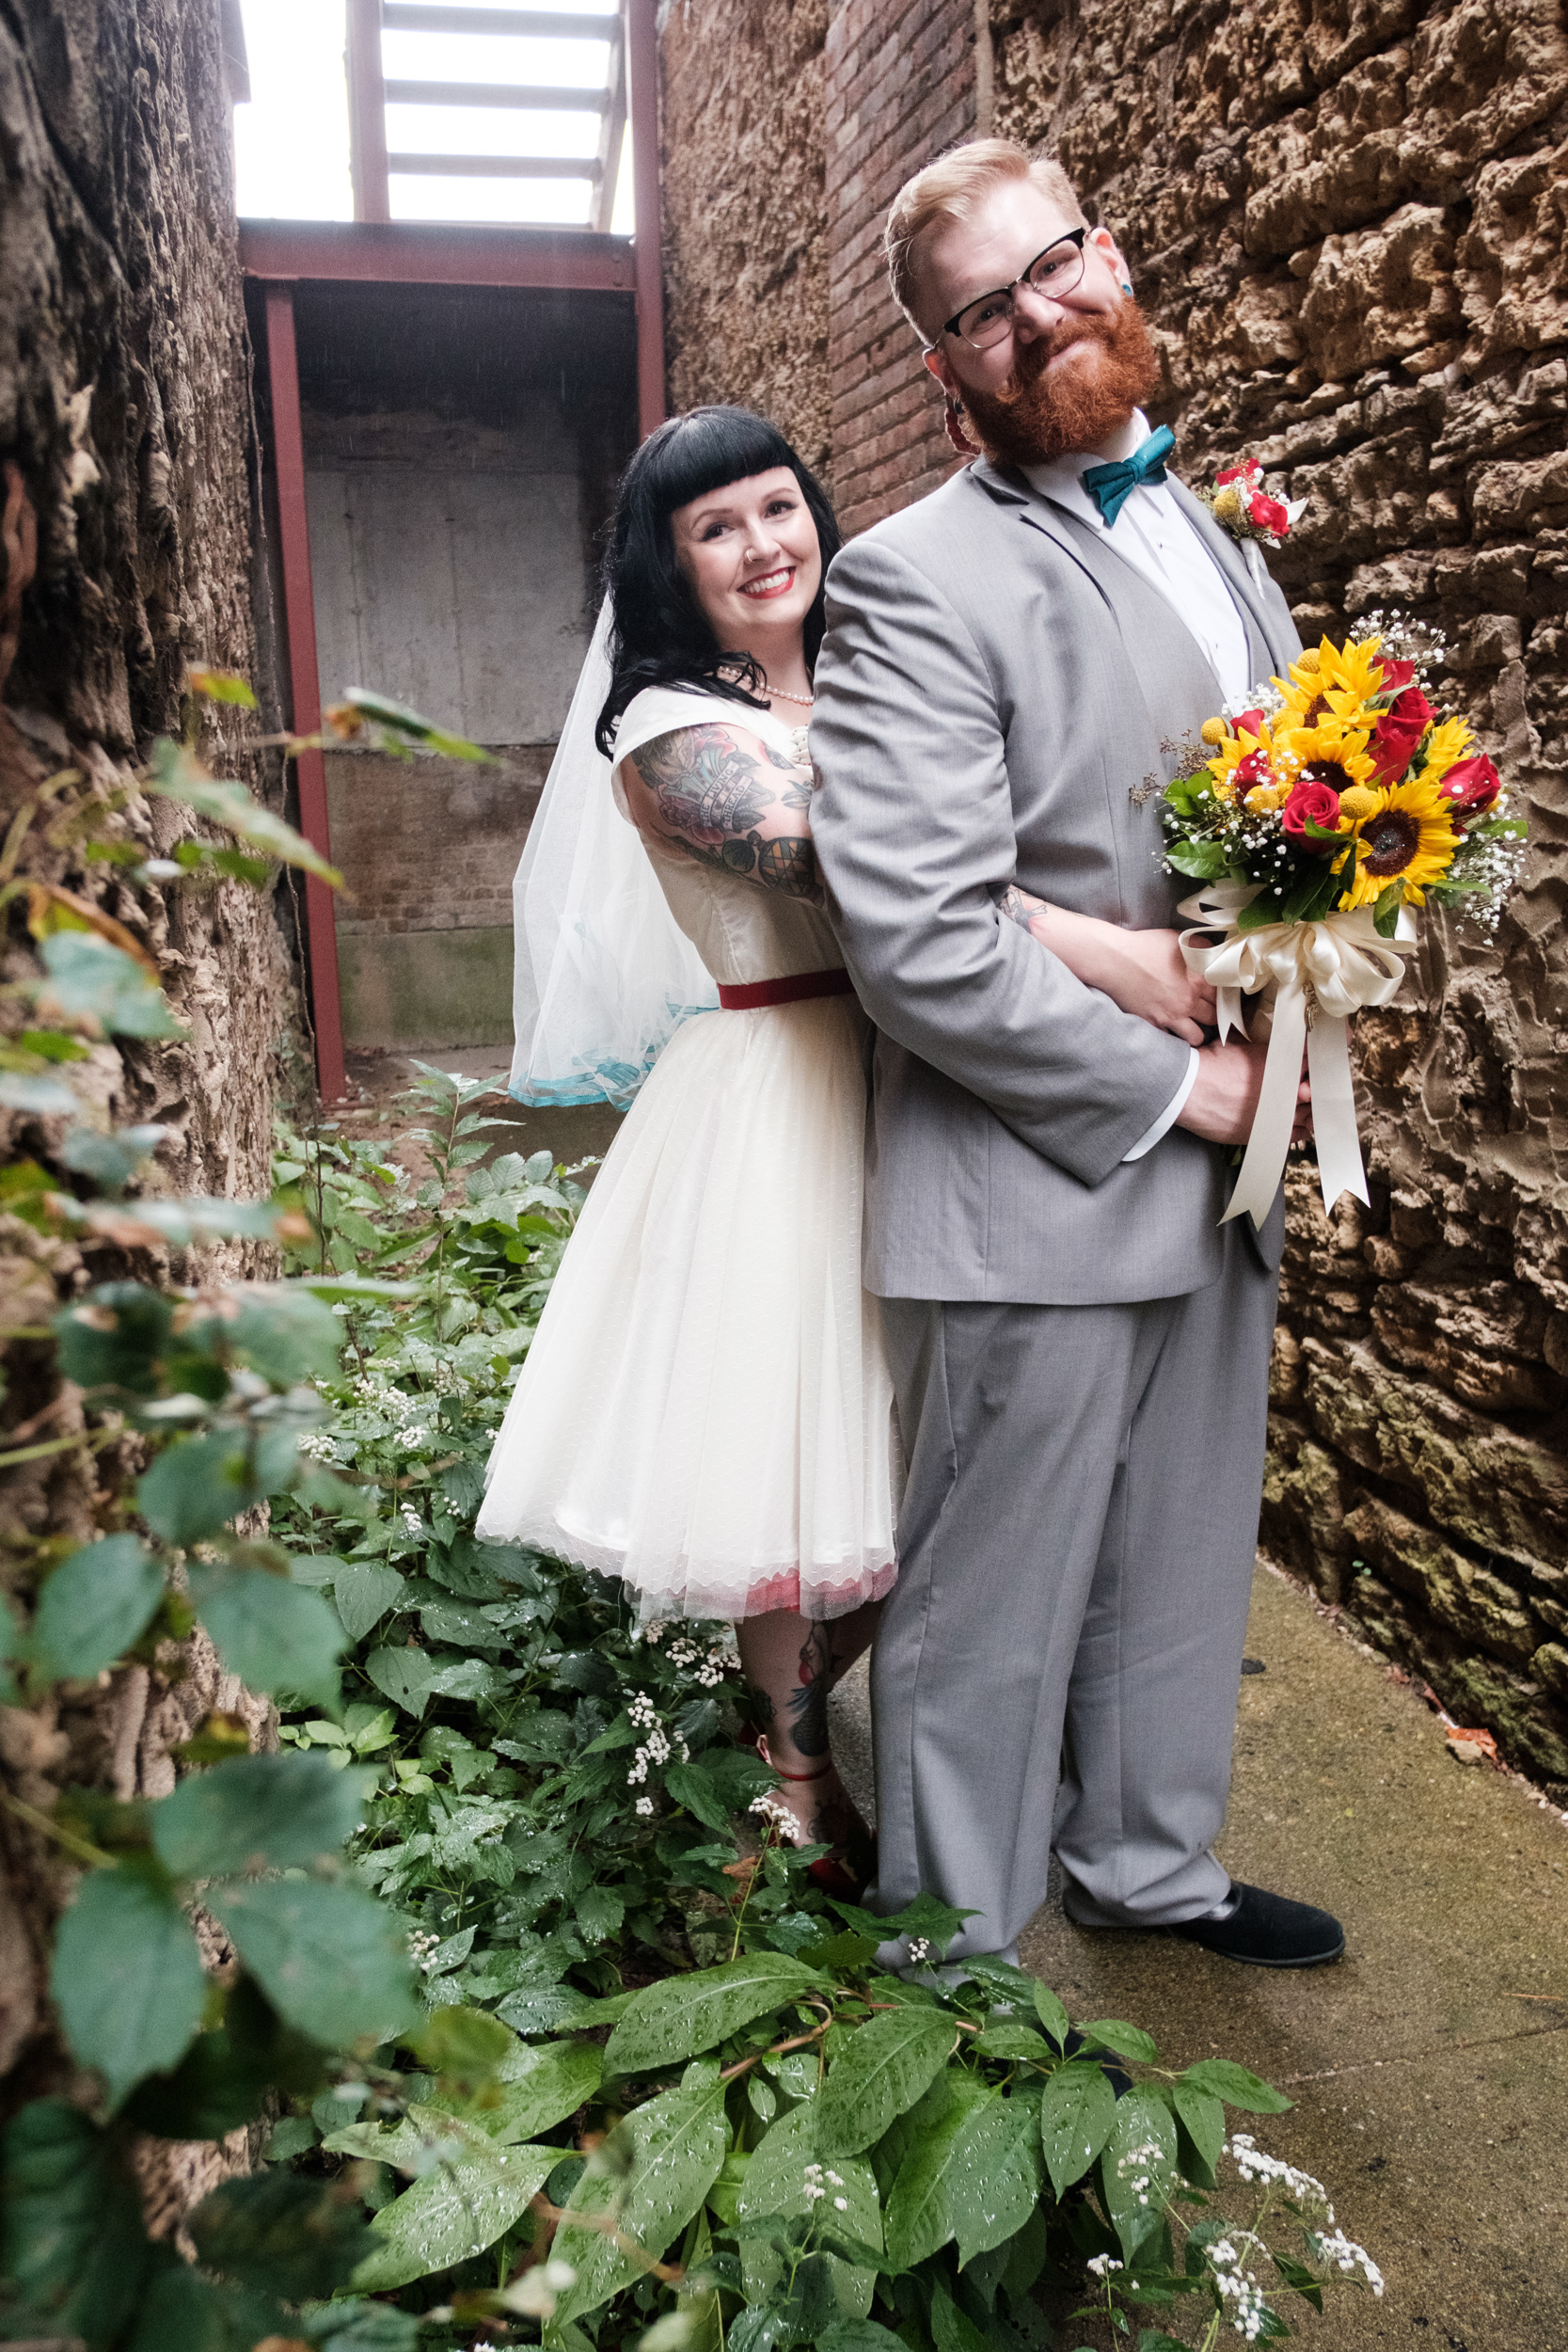 Christian & Sarah wedding photography by Brian milo-197.jpg